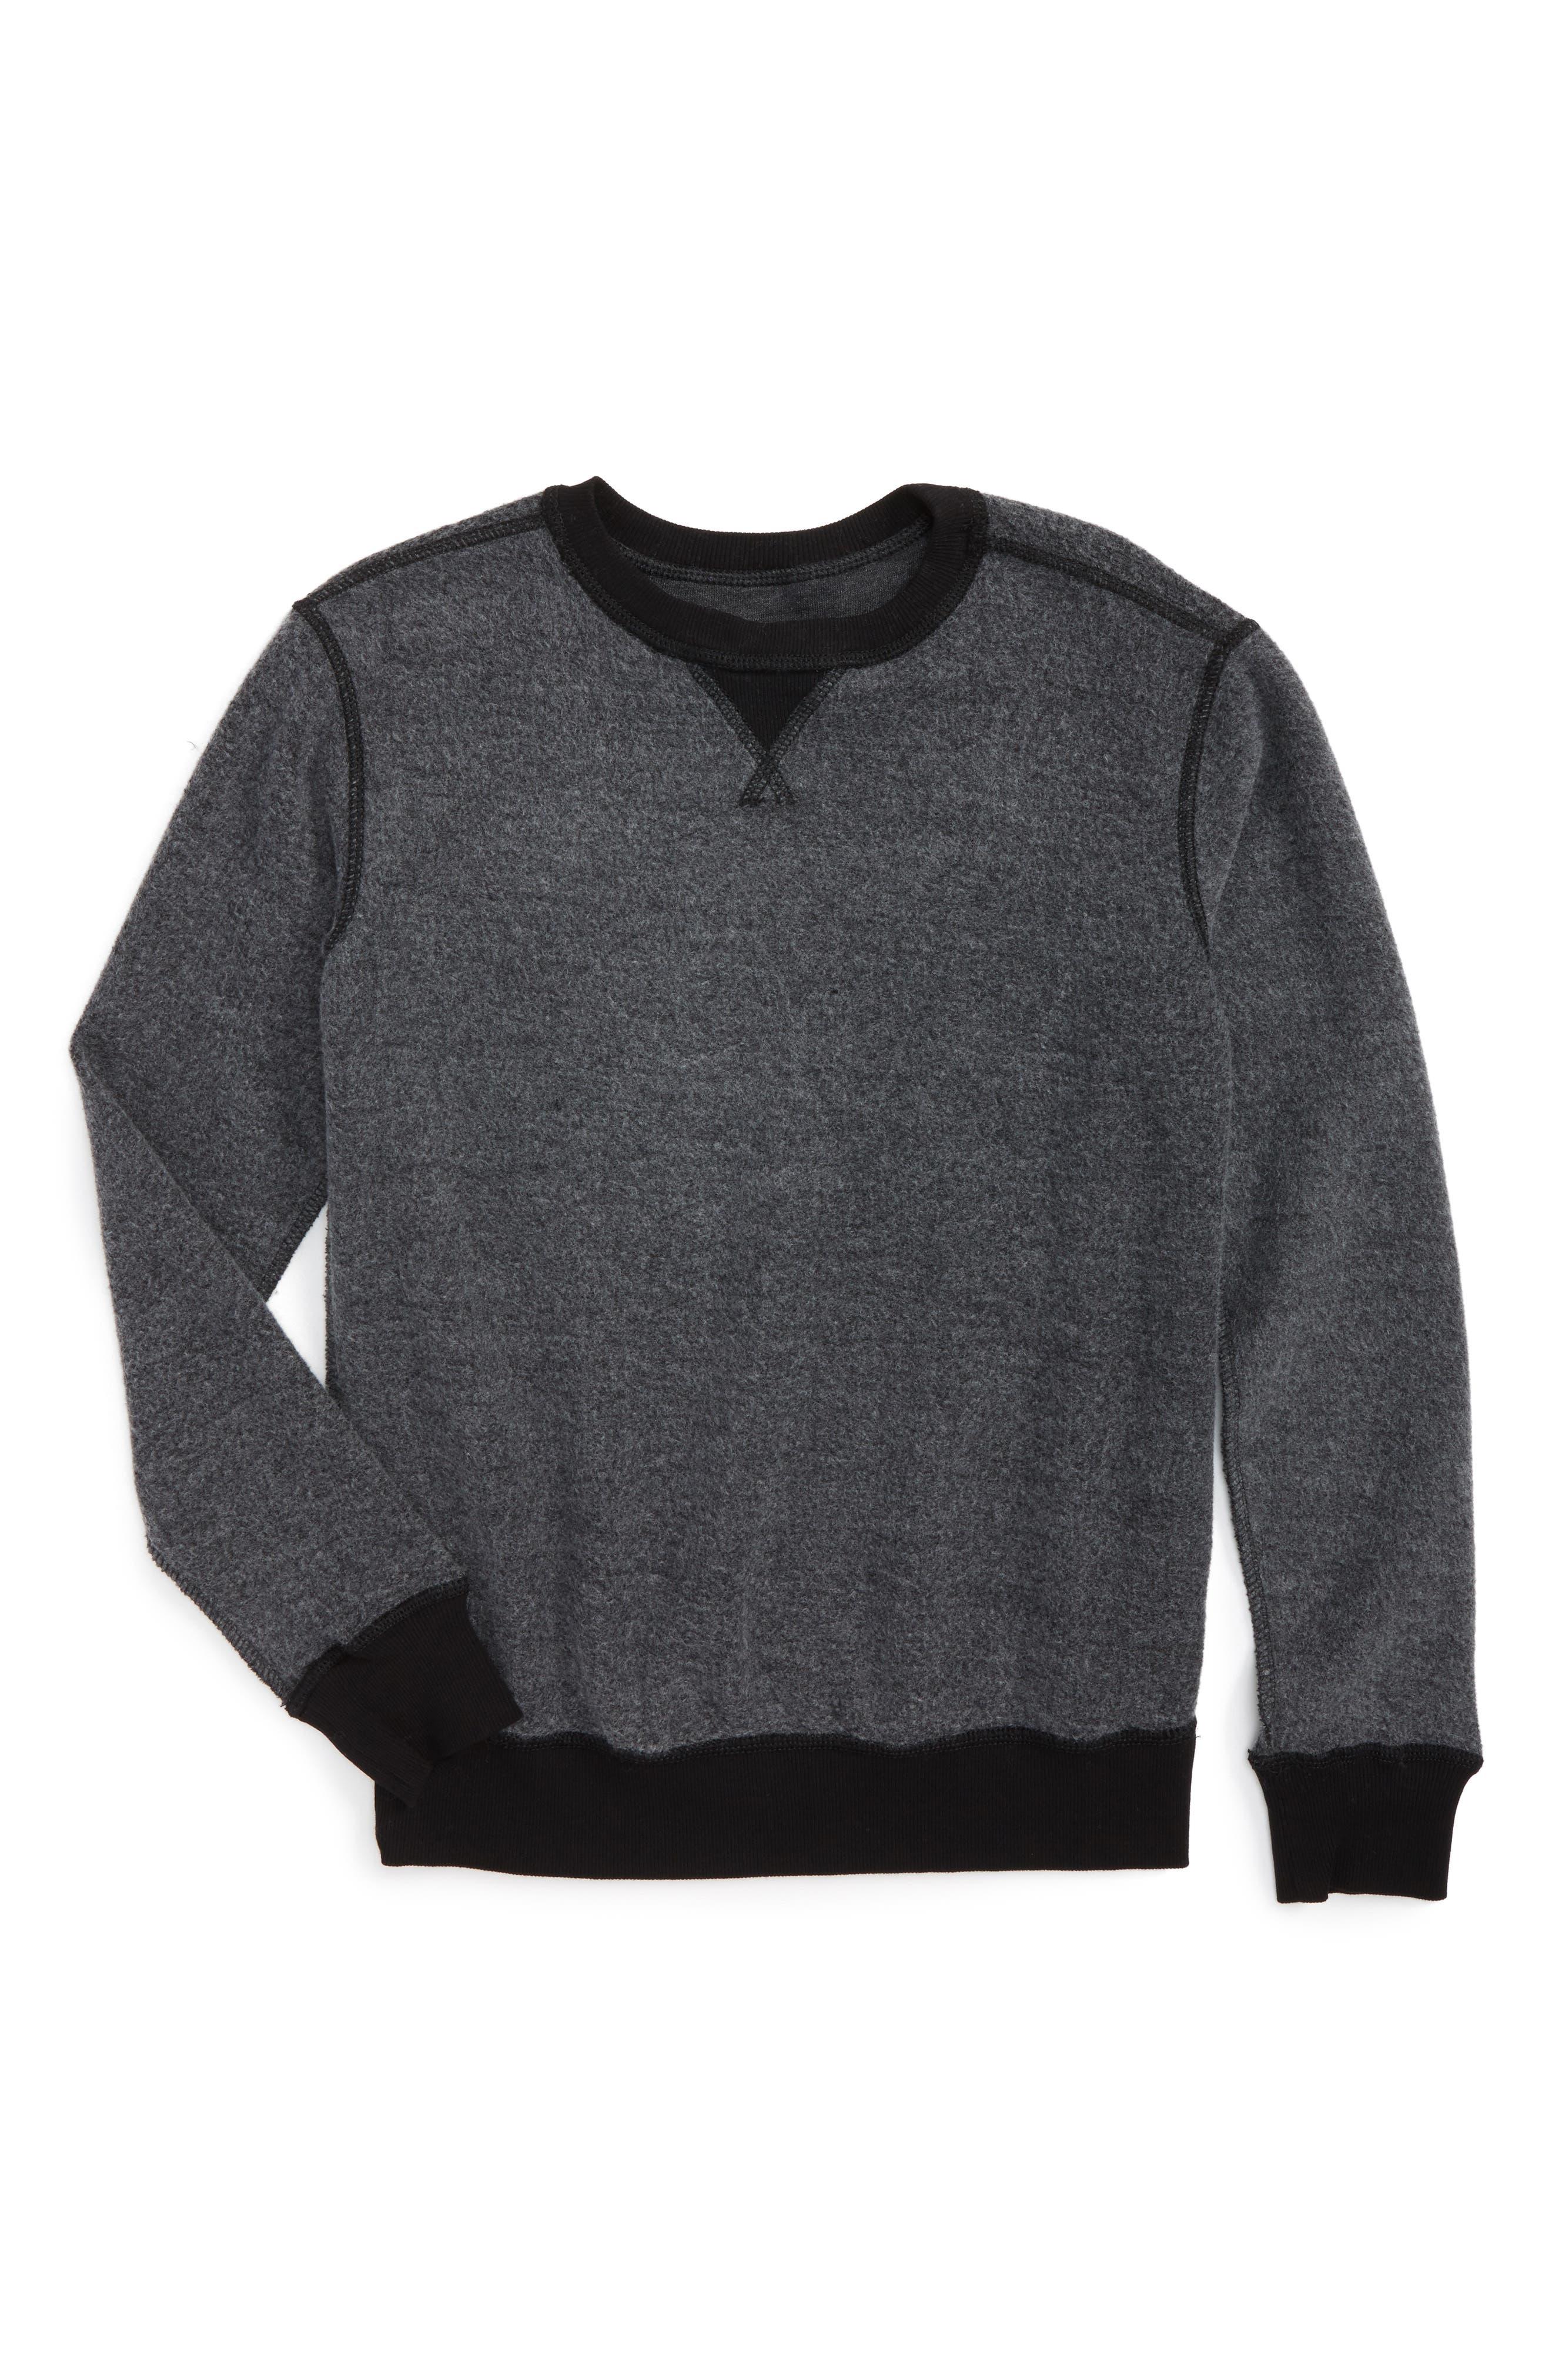 Reverse Crewneck Sweatshirt,                             Main thumbnail 1, color,                             030